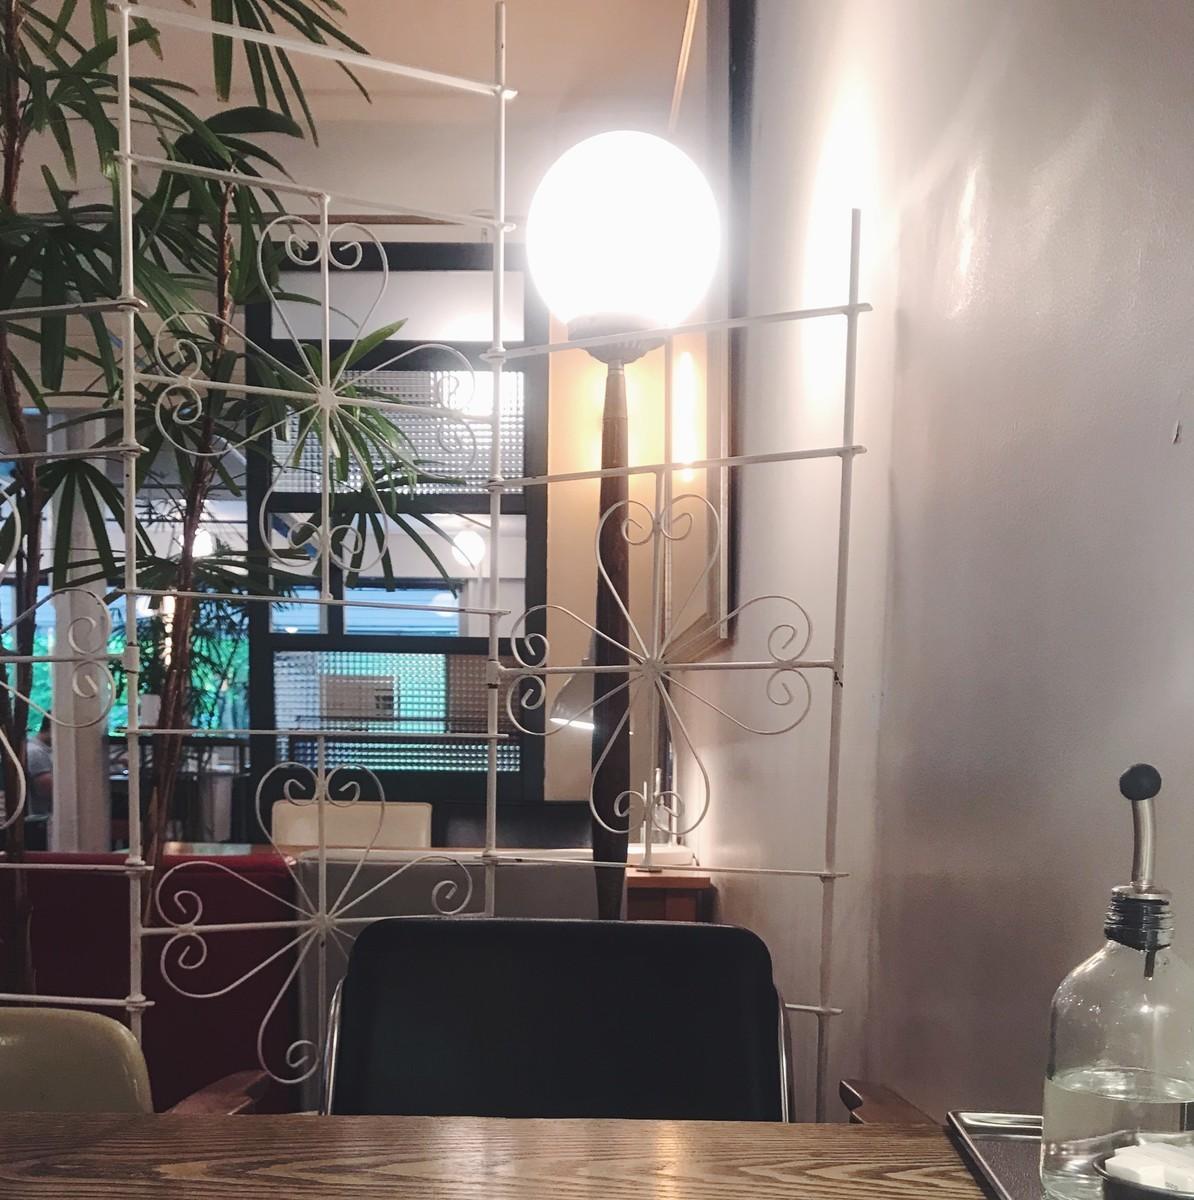 f:id:asacafe:20190820233515j:plain